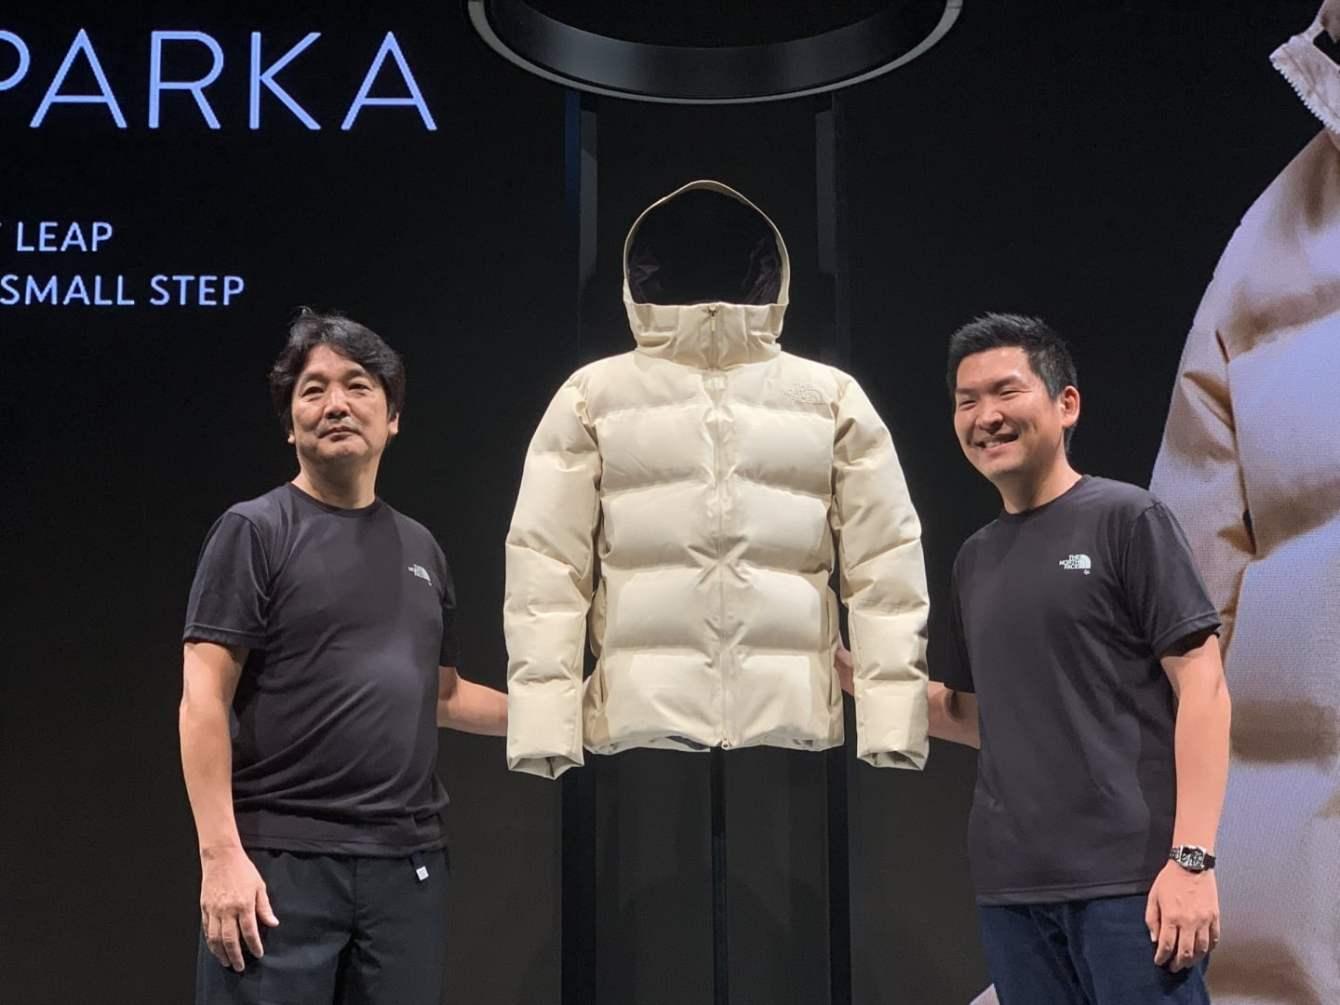 # THE NORTH FACE 攜手 SPIBER 面料科技:人造蜘蛛絲纖維機能服,一件要價15萬日幣! 11